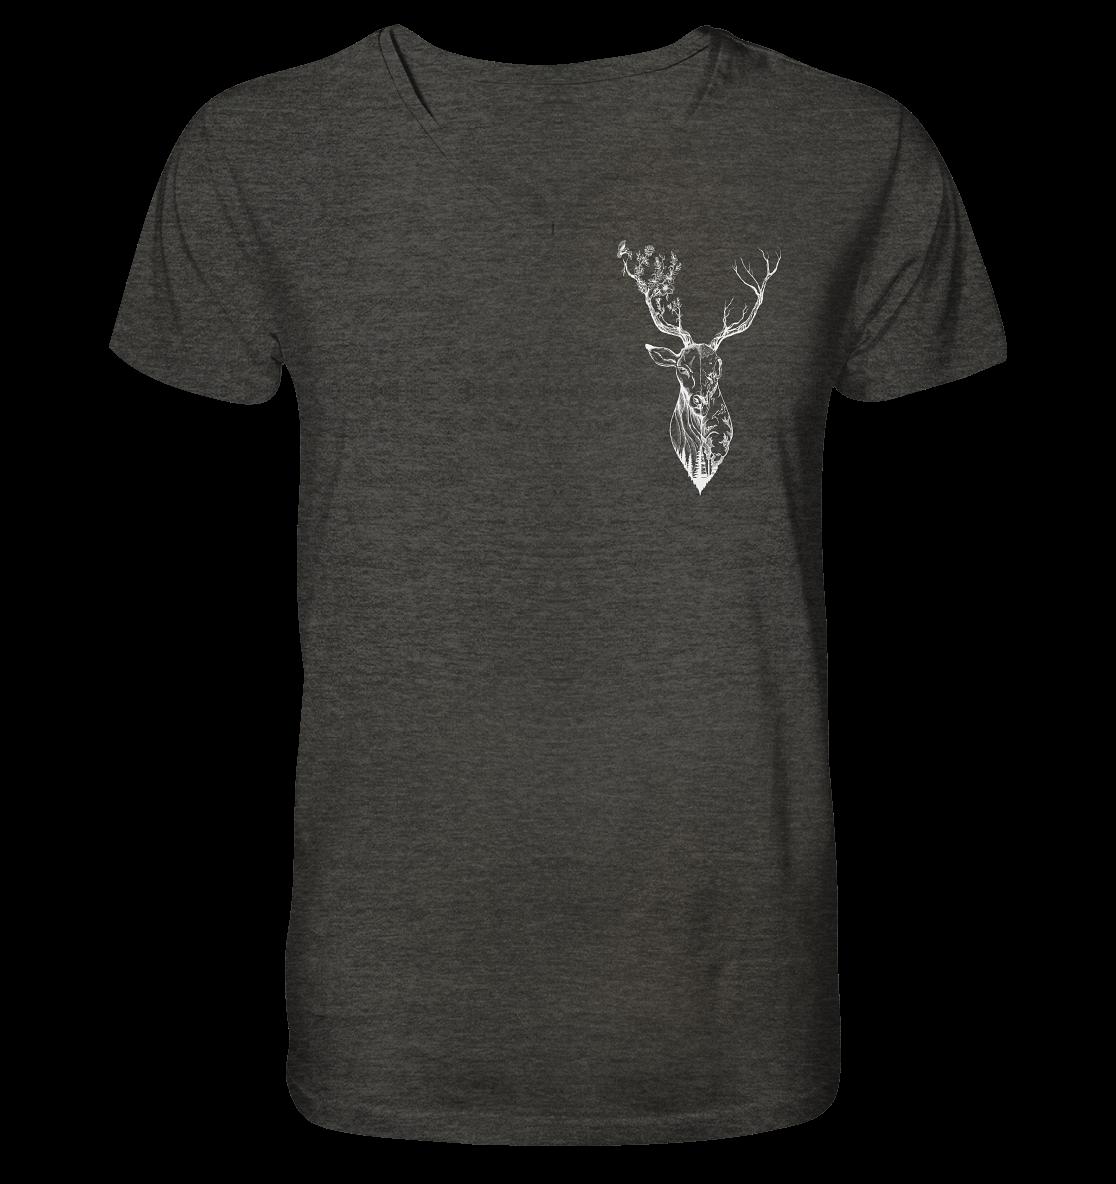 front-mens-organic-v-neck-shirt-252625-1116x-5.png